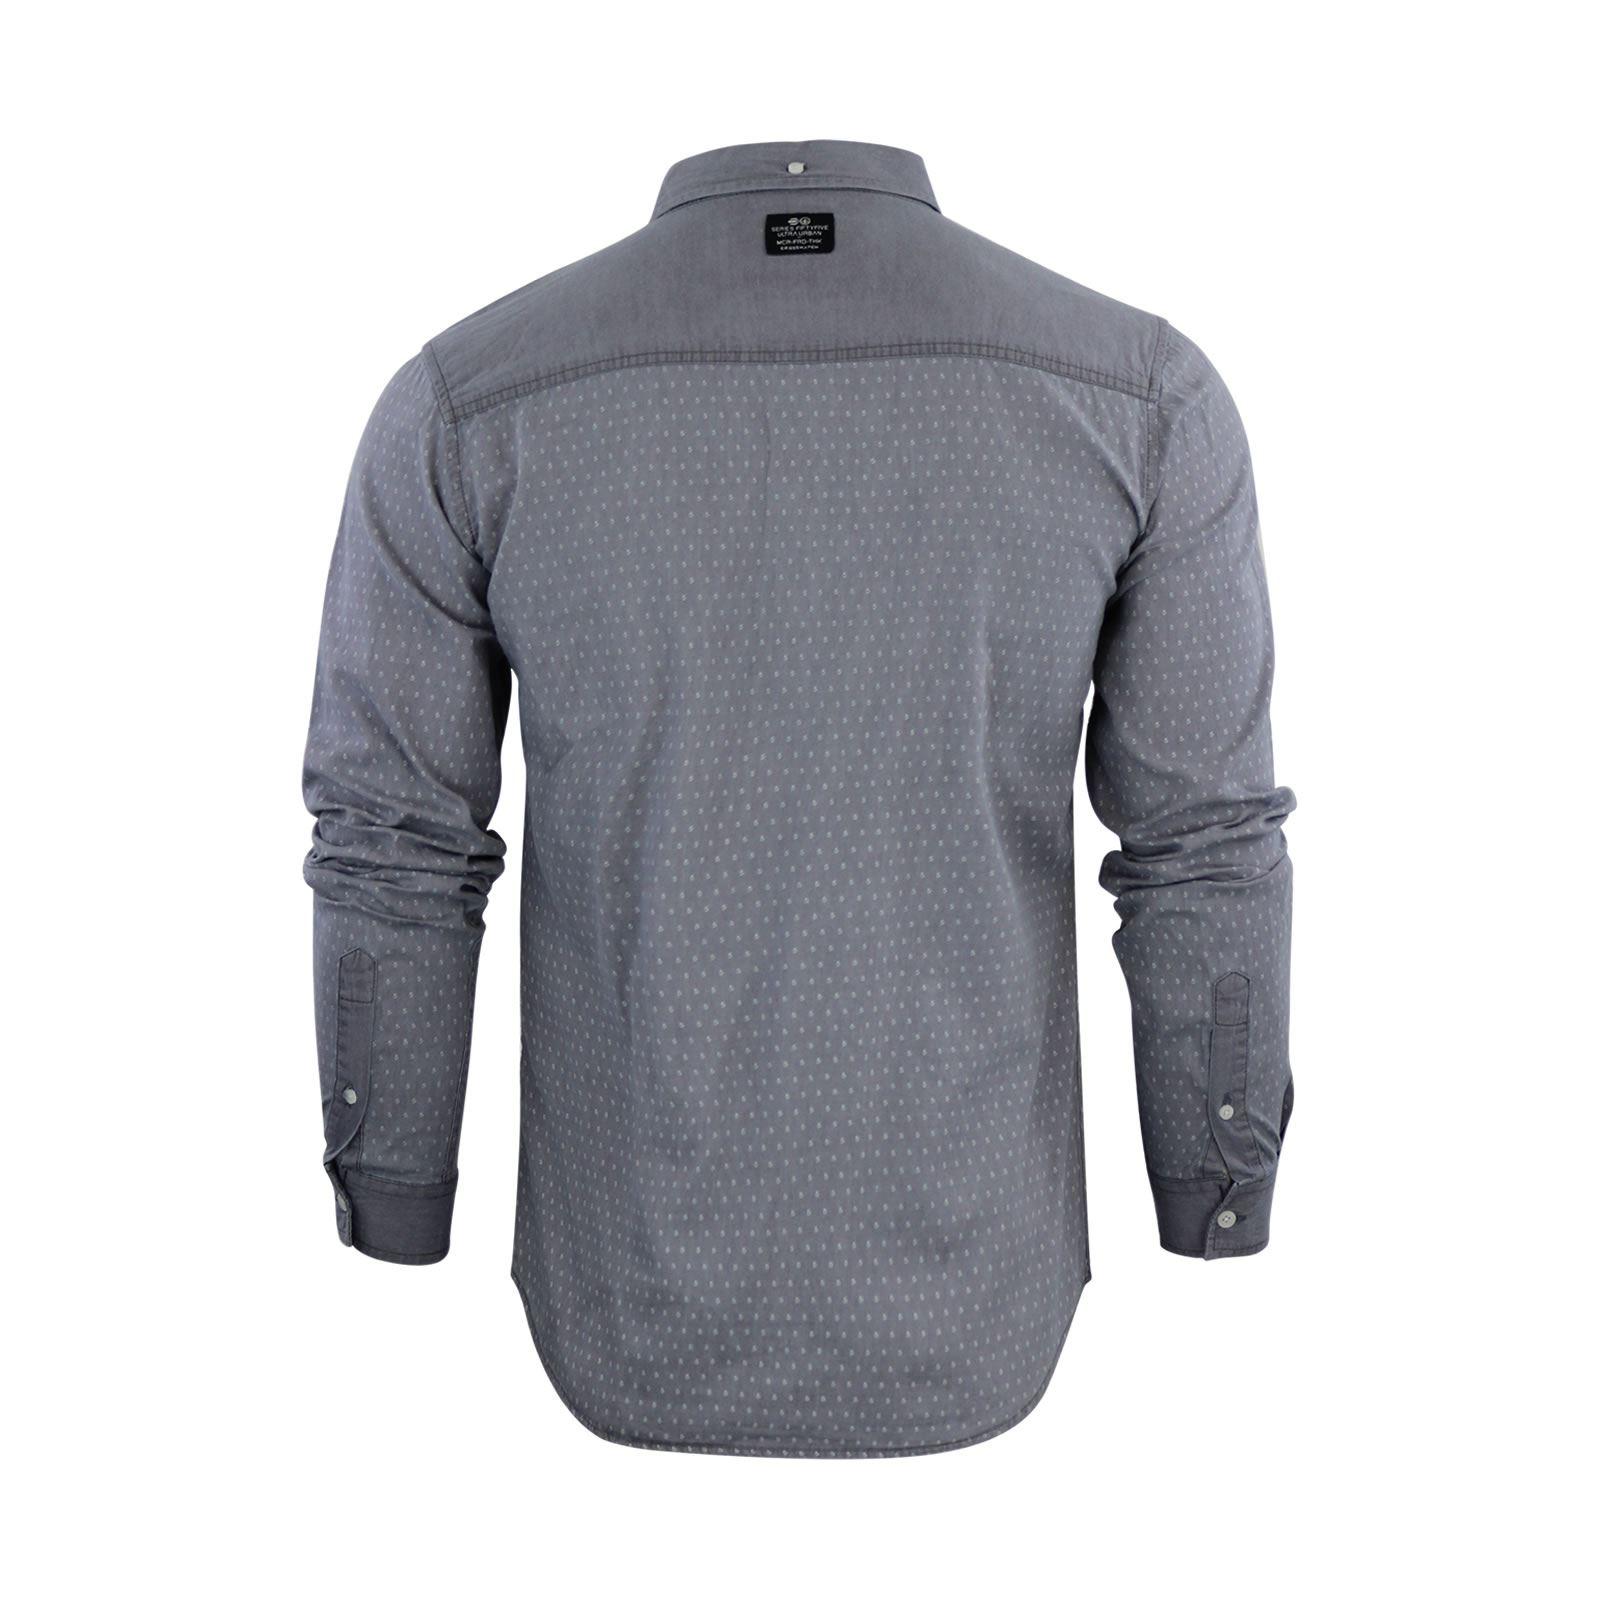 Crosshatch-Plantain-Mens-Denim-Shirt-Cotton-Long-Sleeve-Collared-Casual-Top